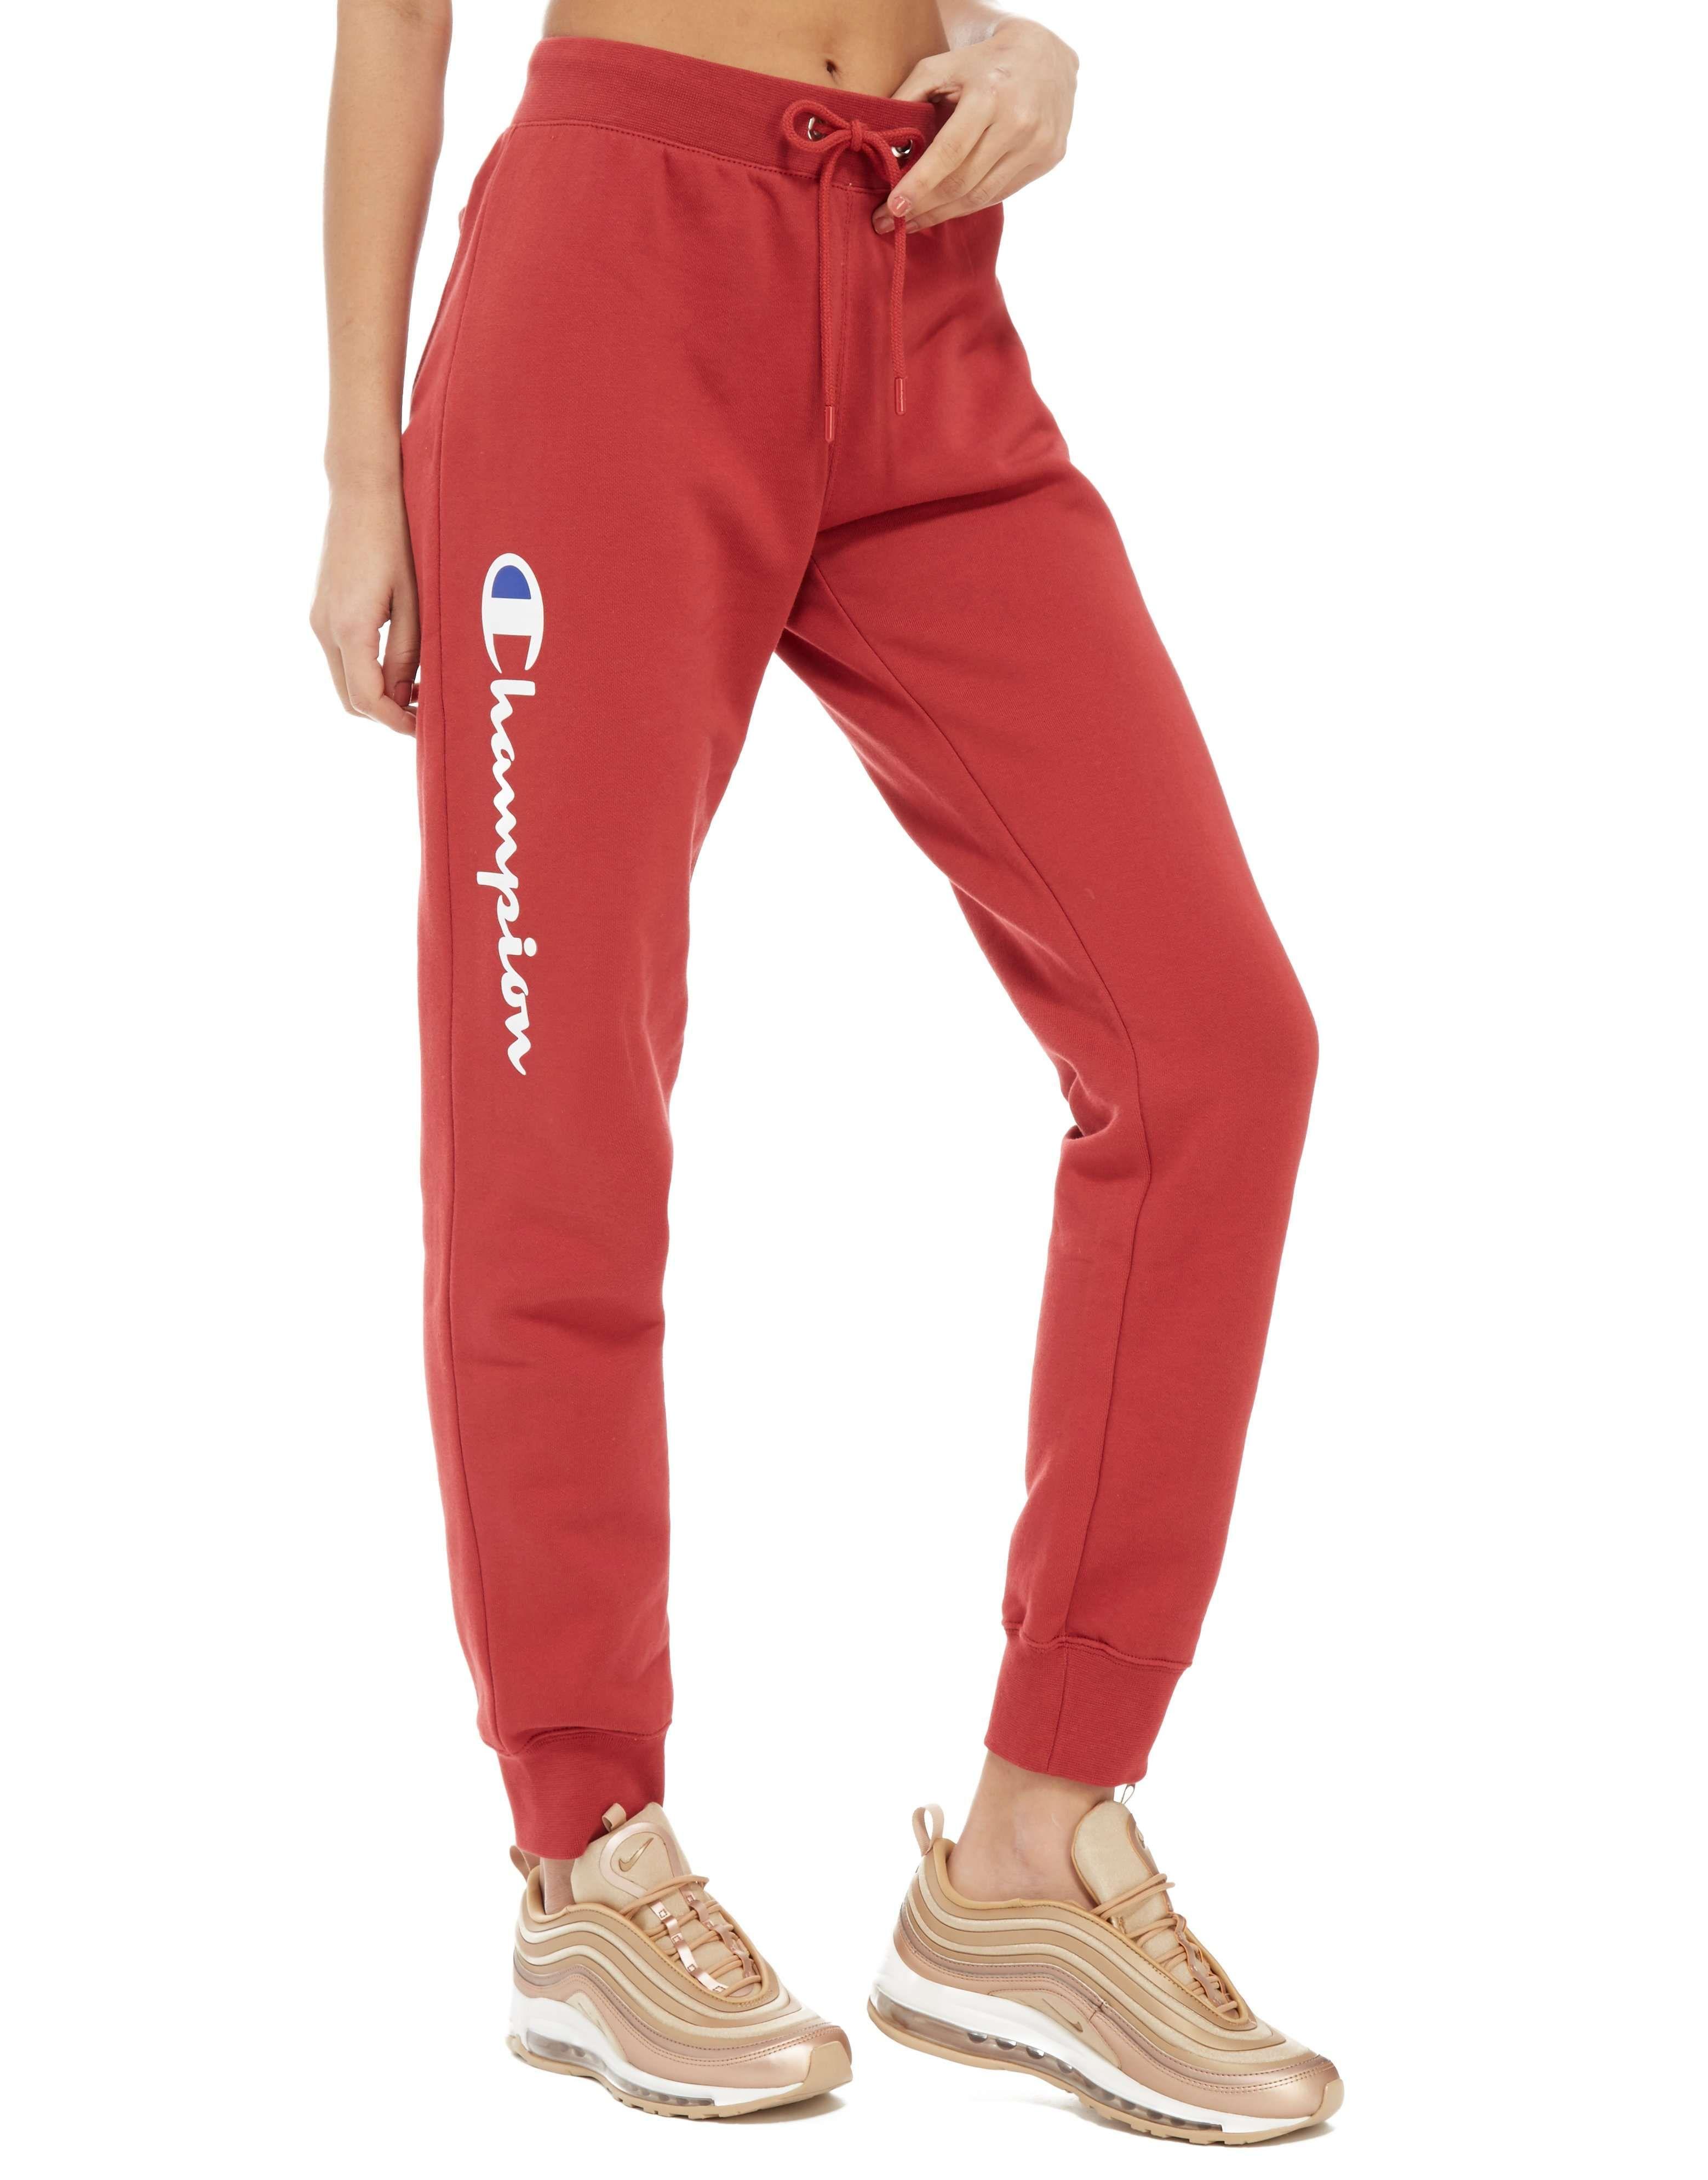 extremely unique famous designer brand save up to 80% Champion Fleece Pants - Shop online for Champion Fleece ...